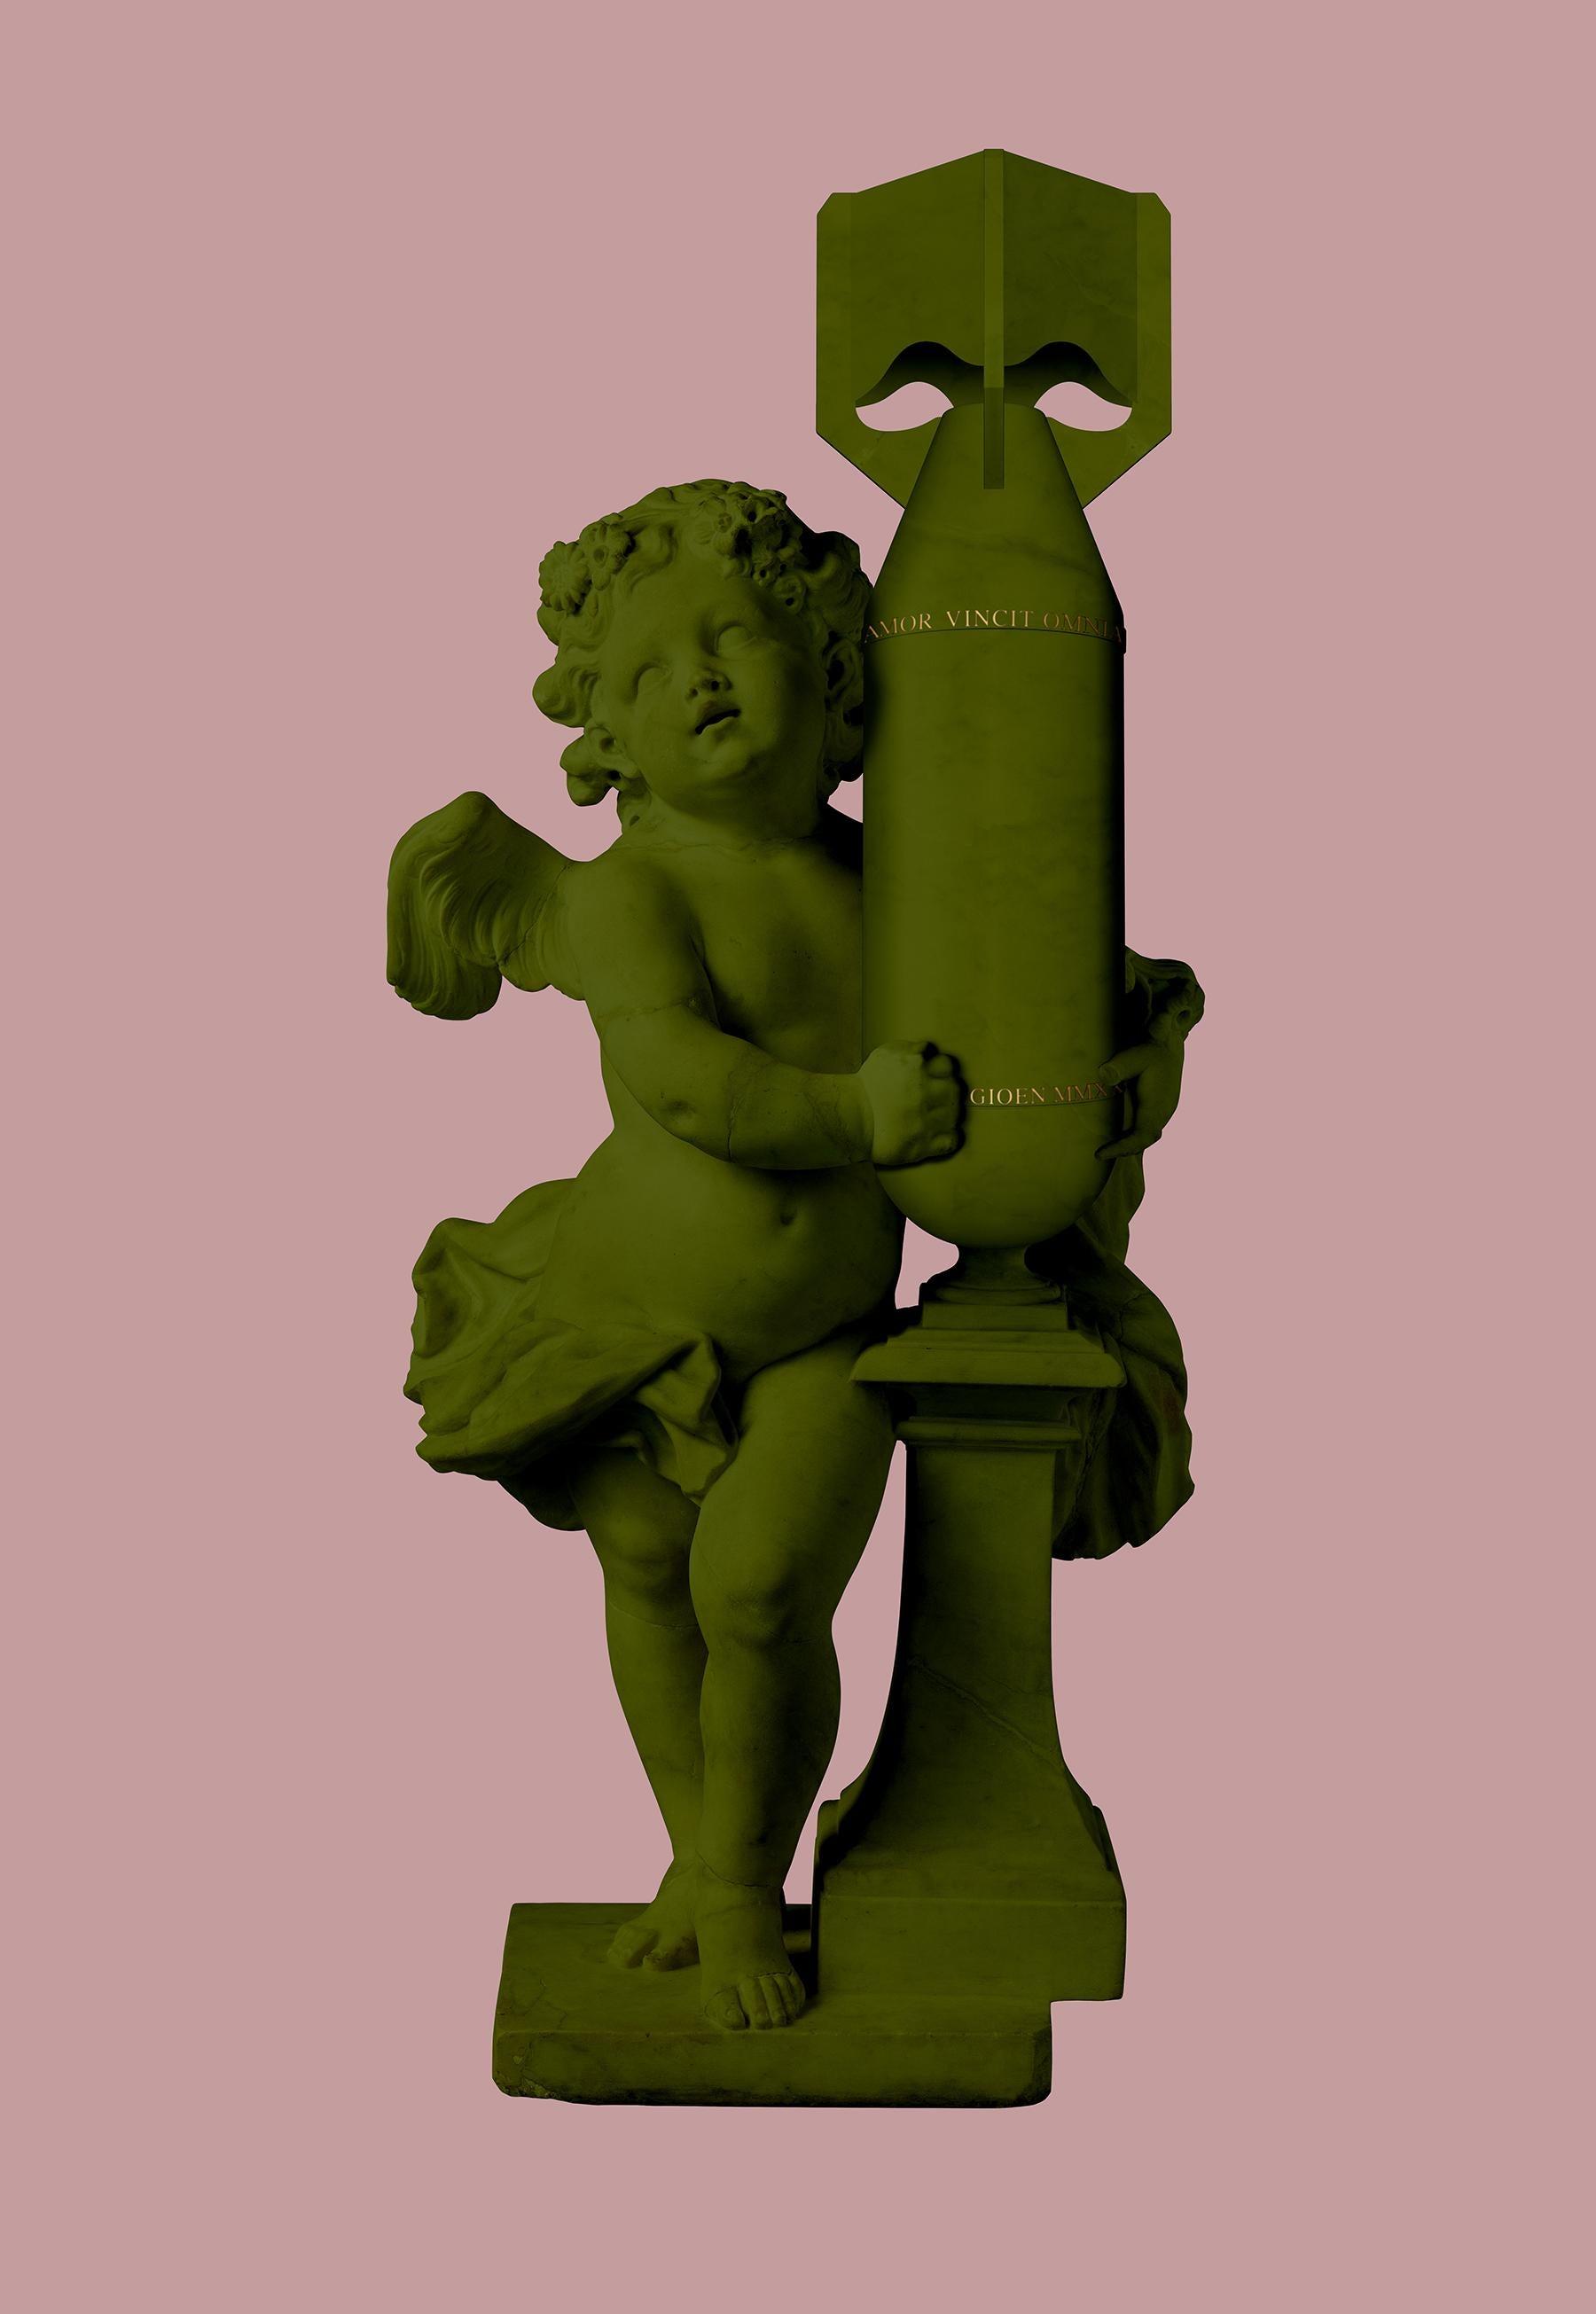 CUPID (AMOR VINCIT OMNIA) ARMY GREEN